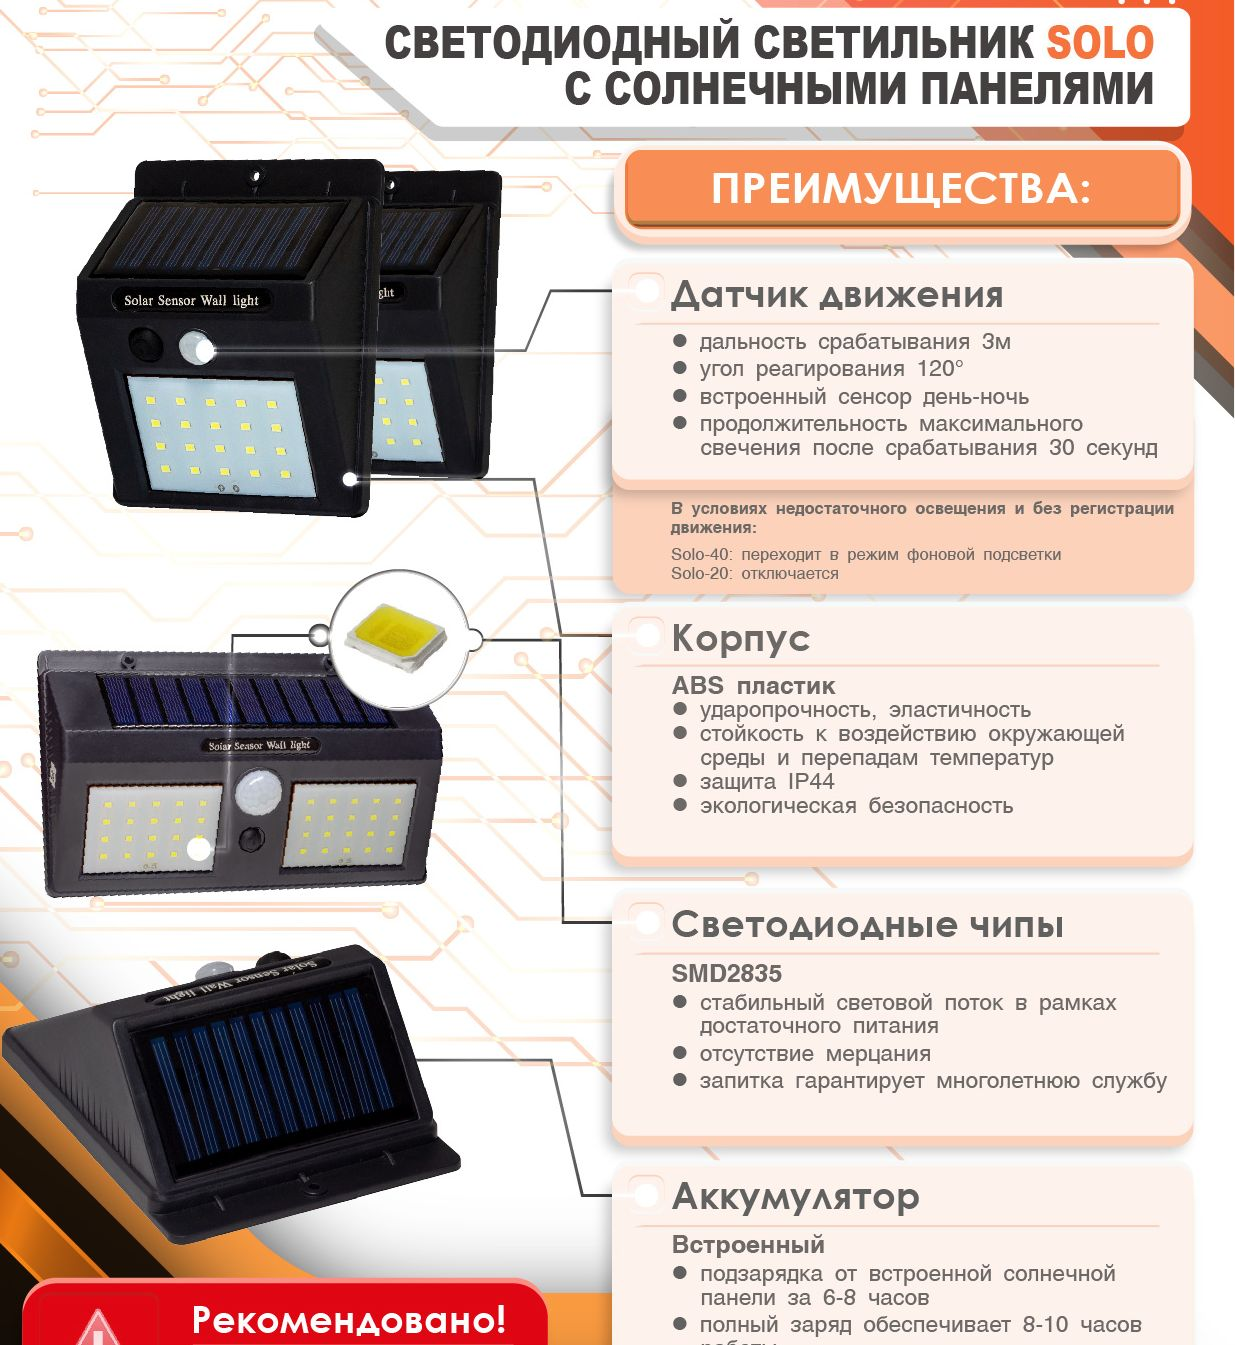 Светильники на солнечных батареях SOLO